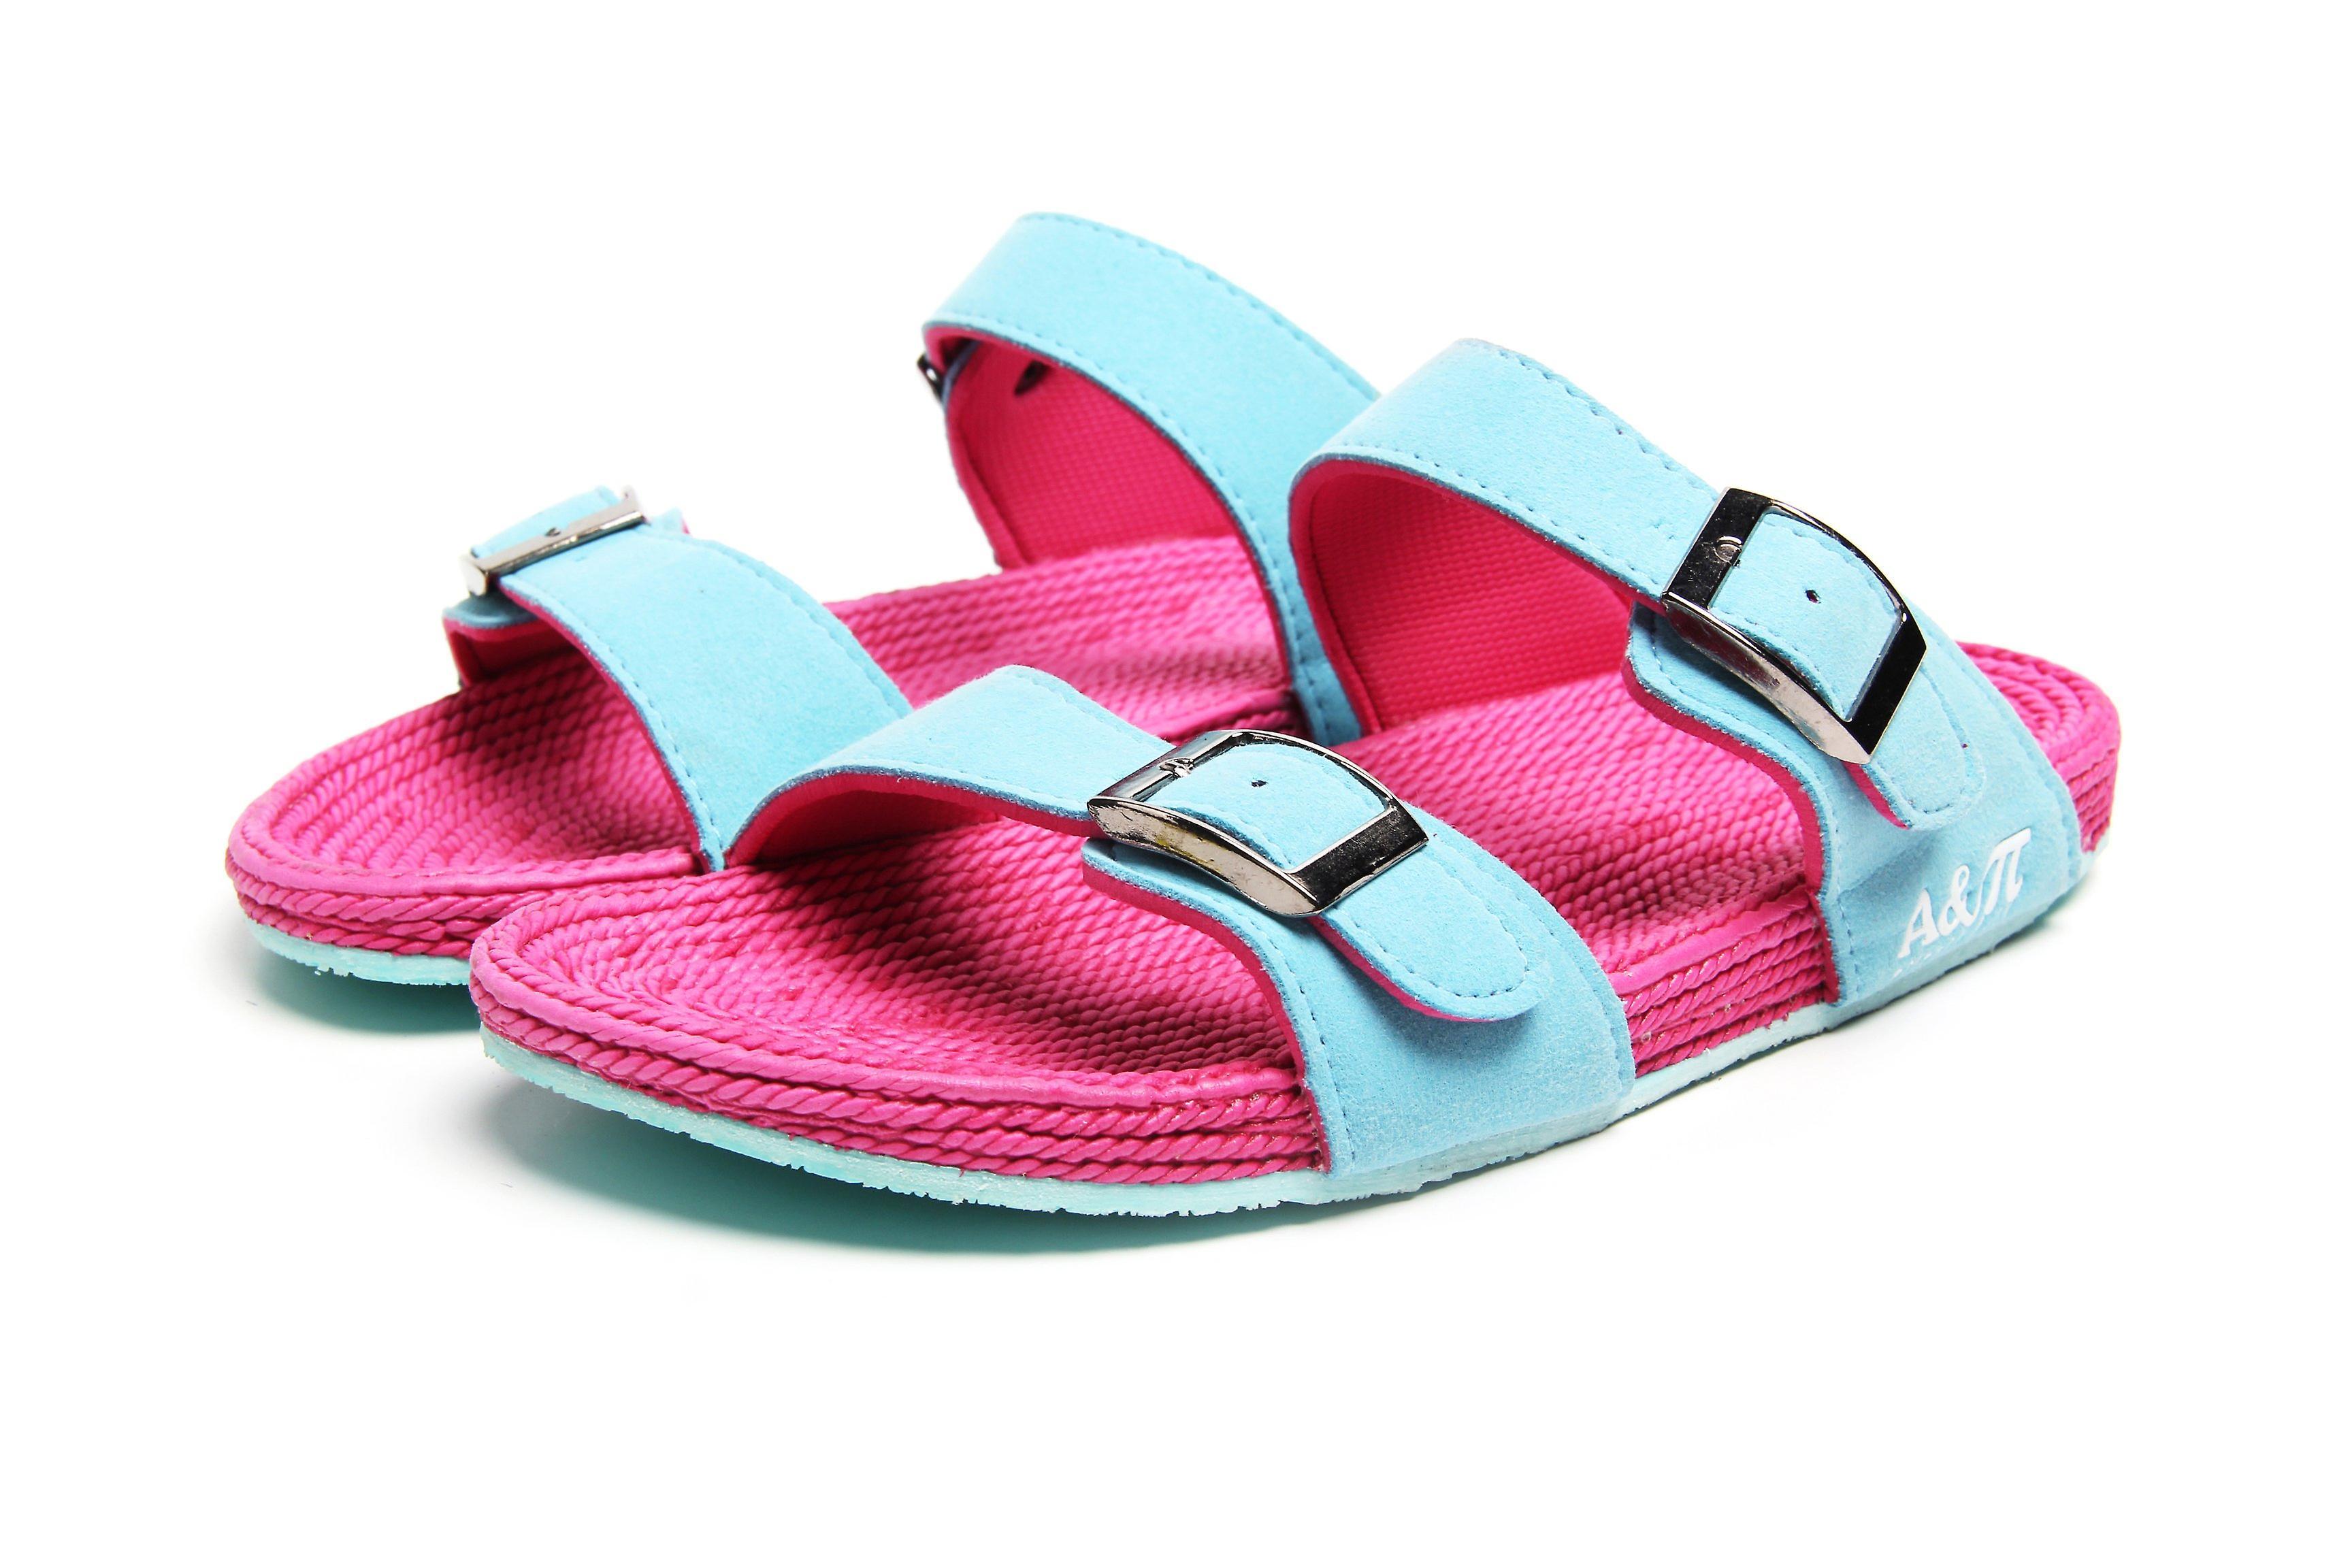 Dual band turquoise-fuchsia sandals